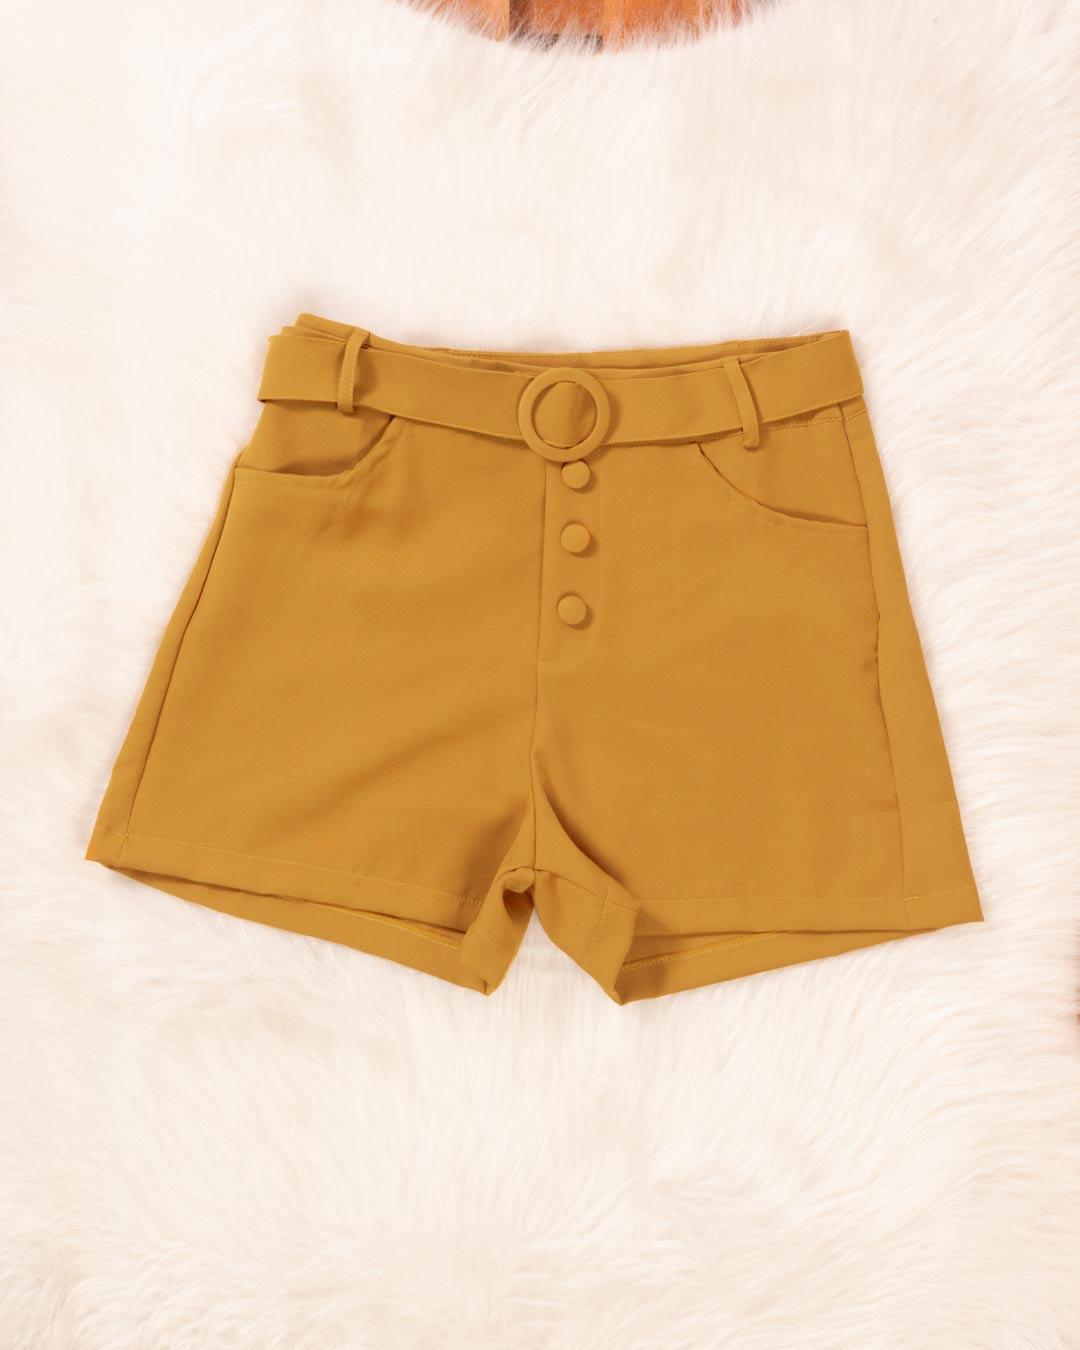 Shorts Adulto Com Cinto e Zíper Lateral - The Moment